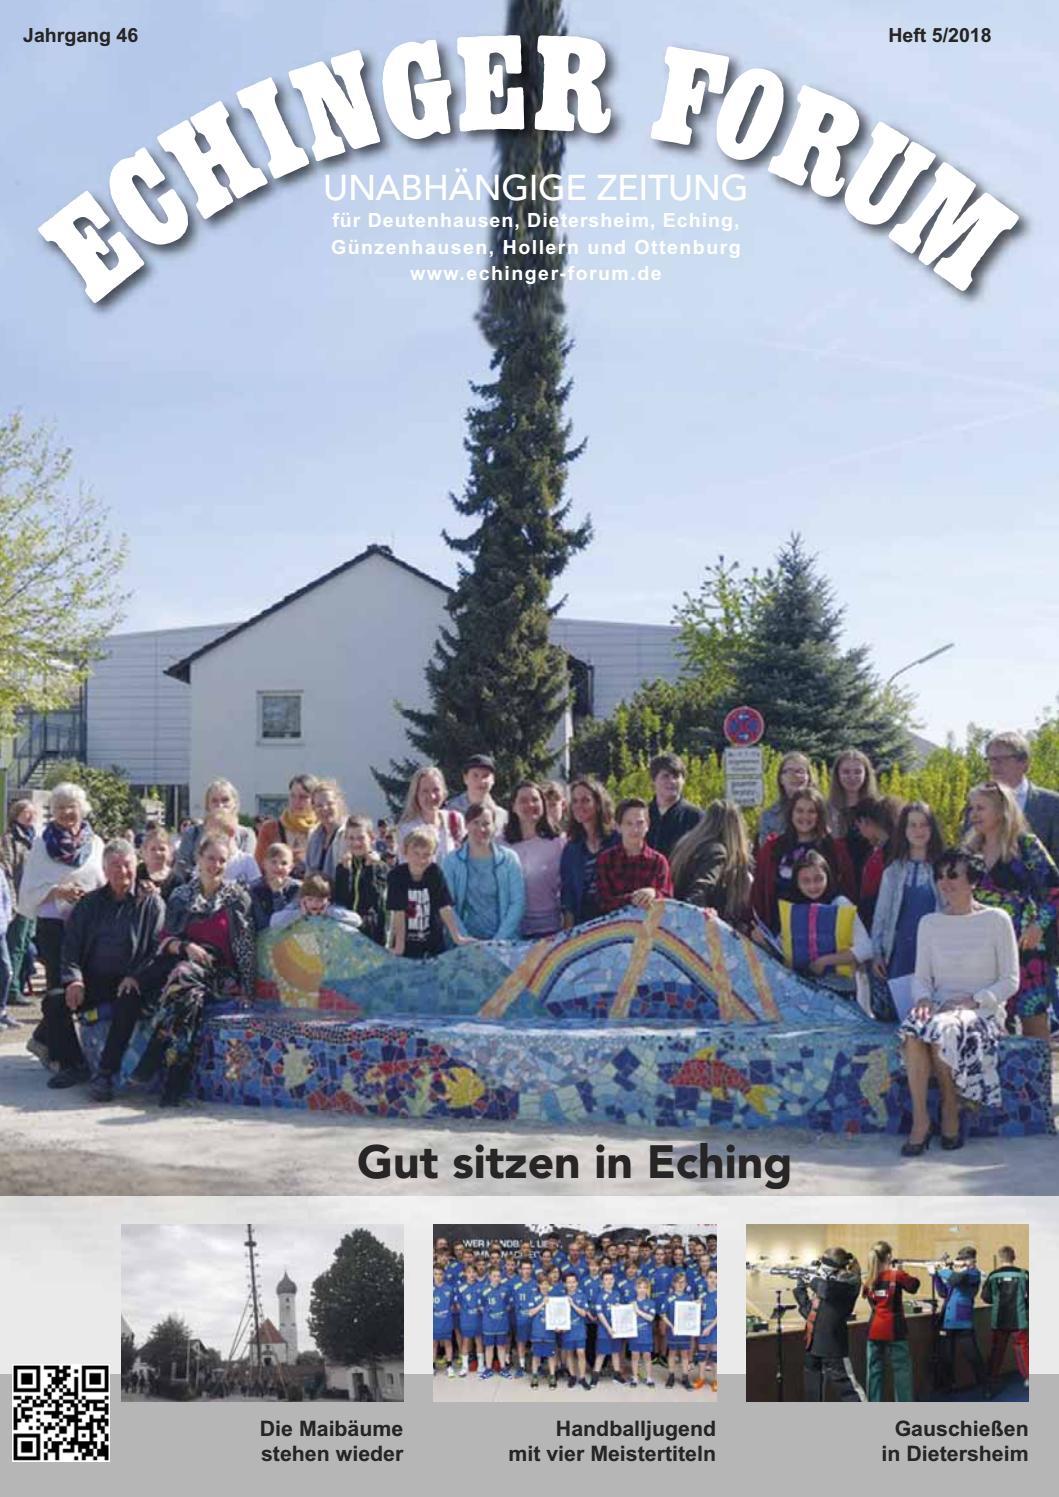 2018 05i by zillgitt - bfk buero fuer kommunikation - issuu